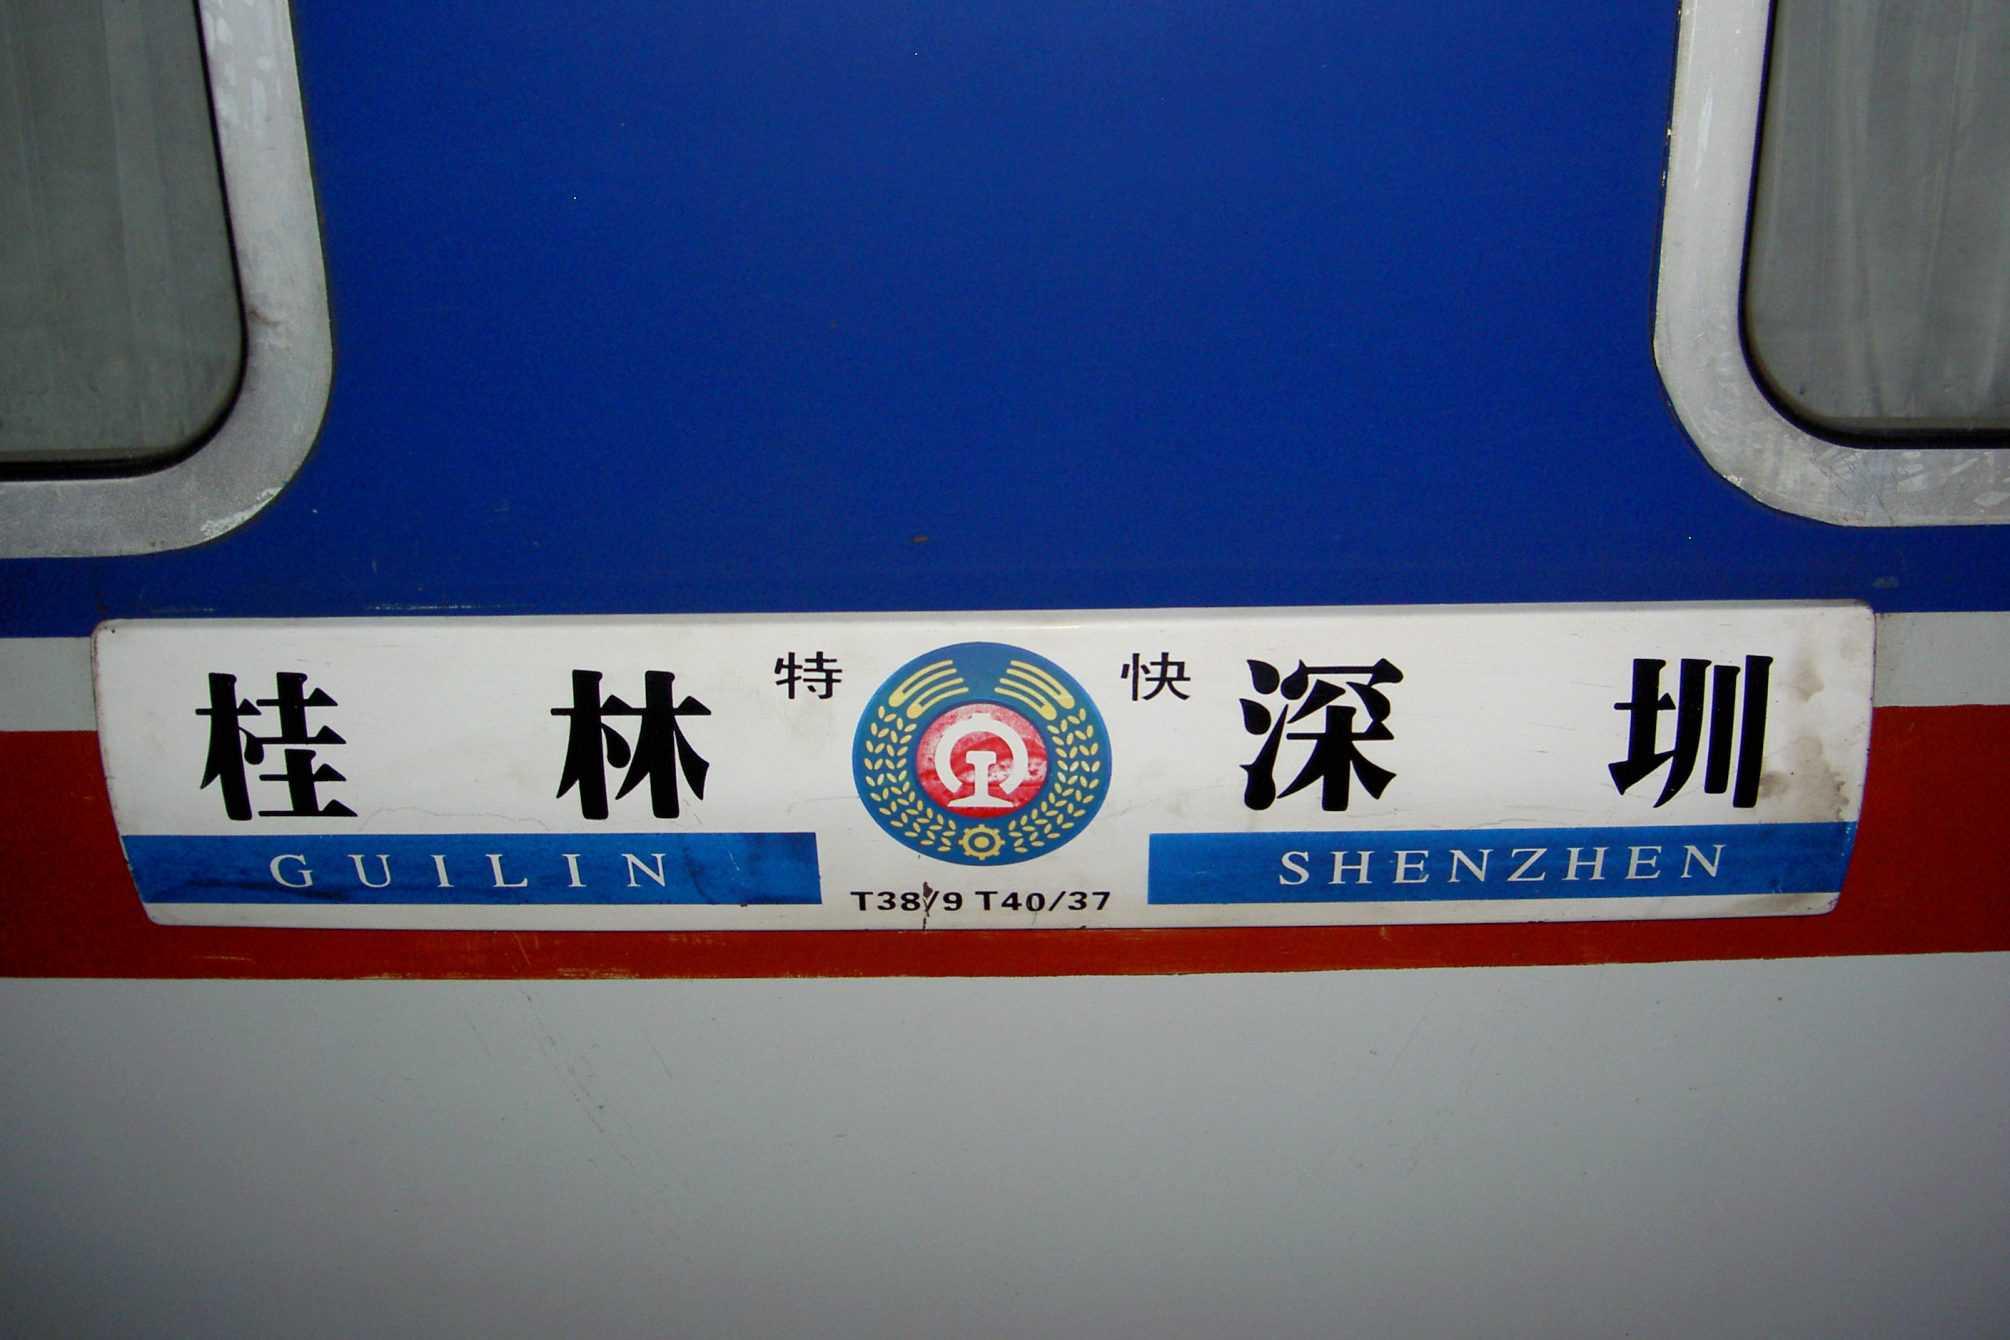 Guilin to Shenzen train